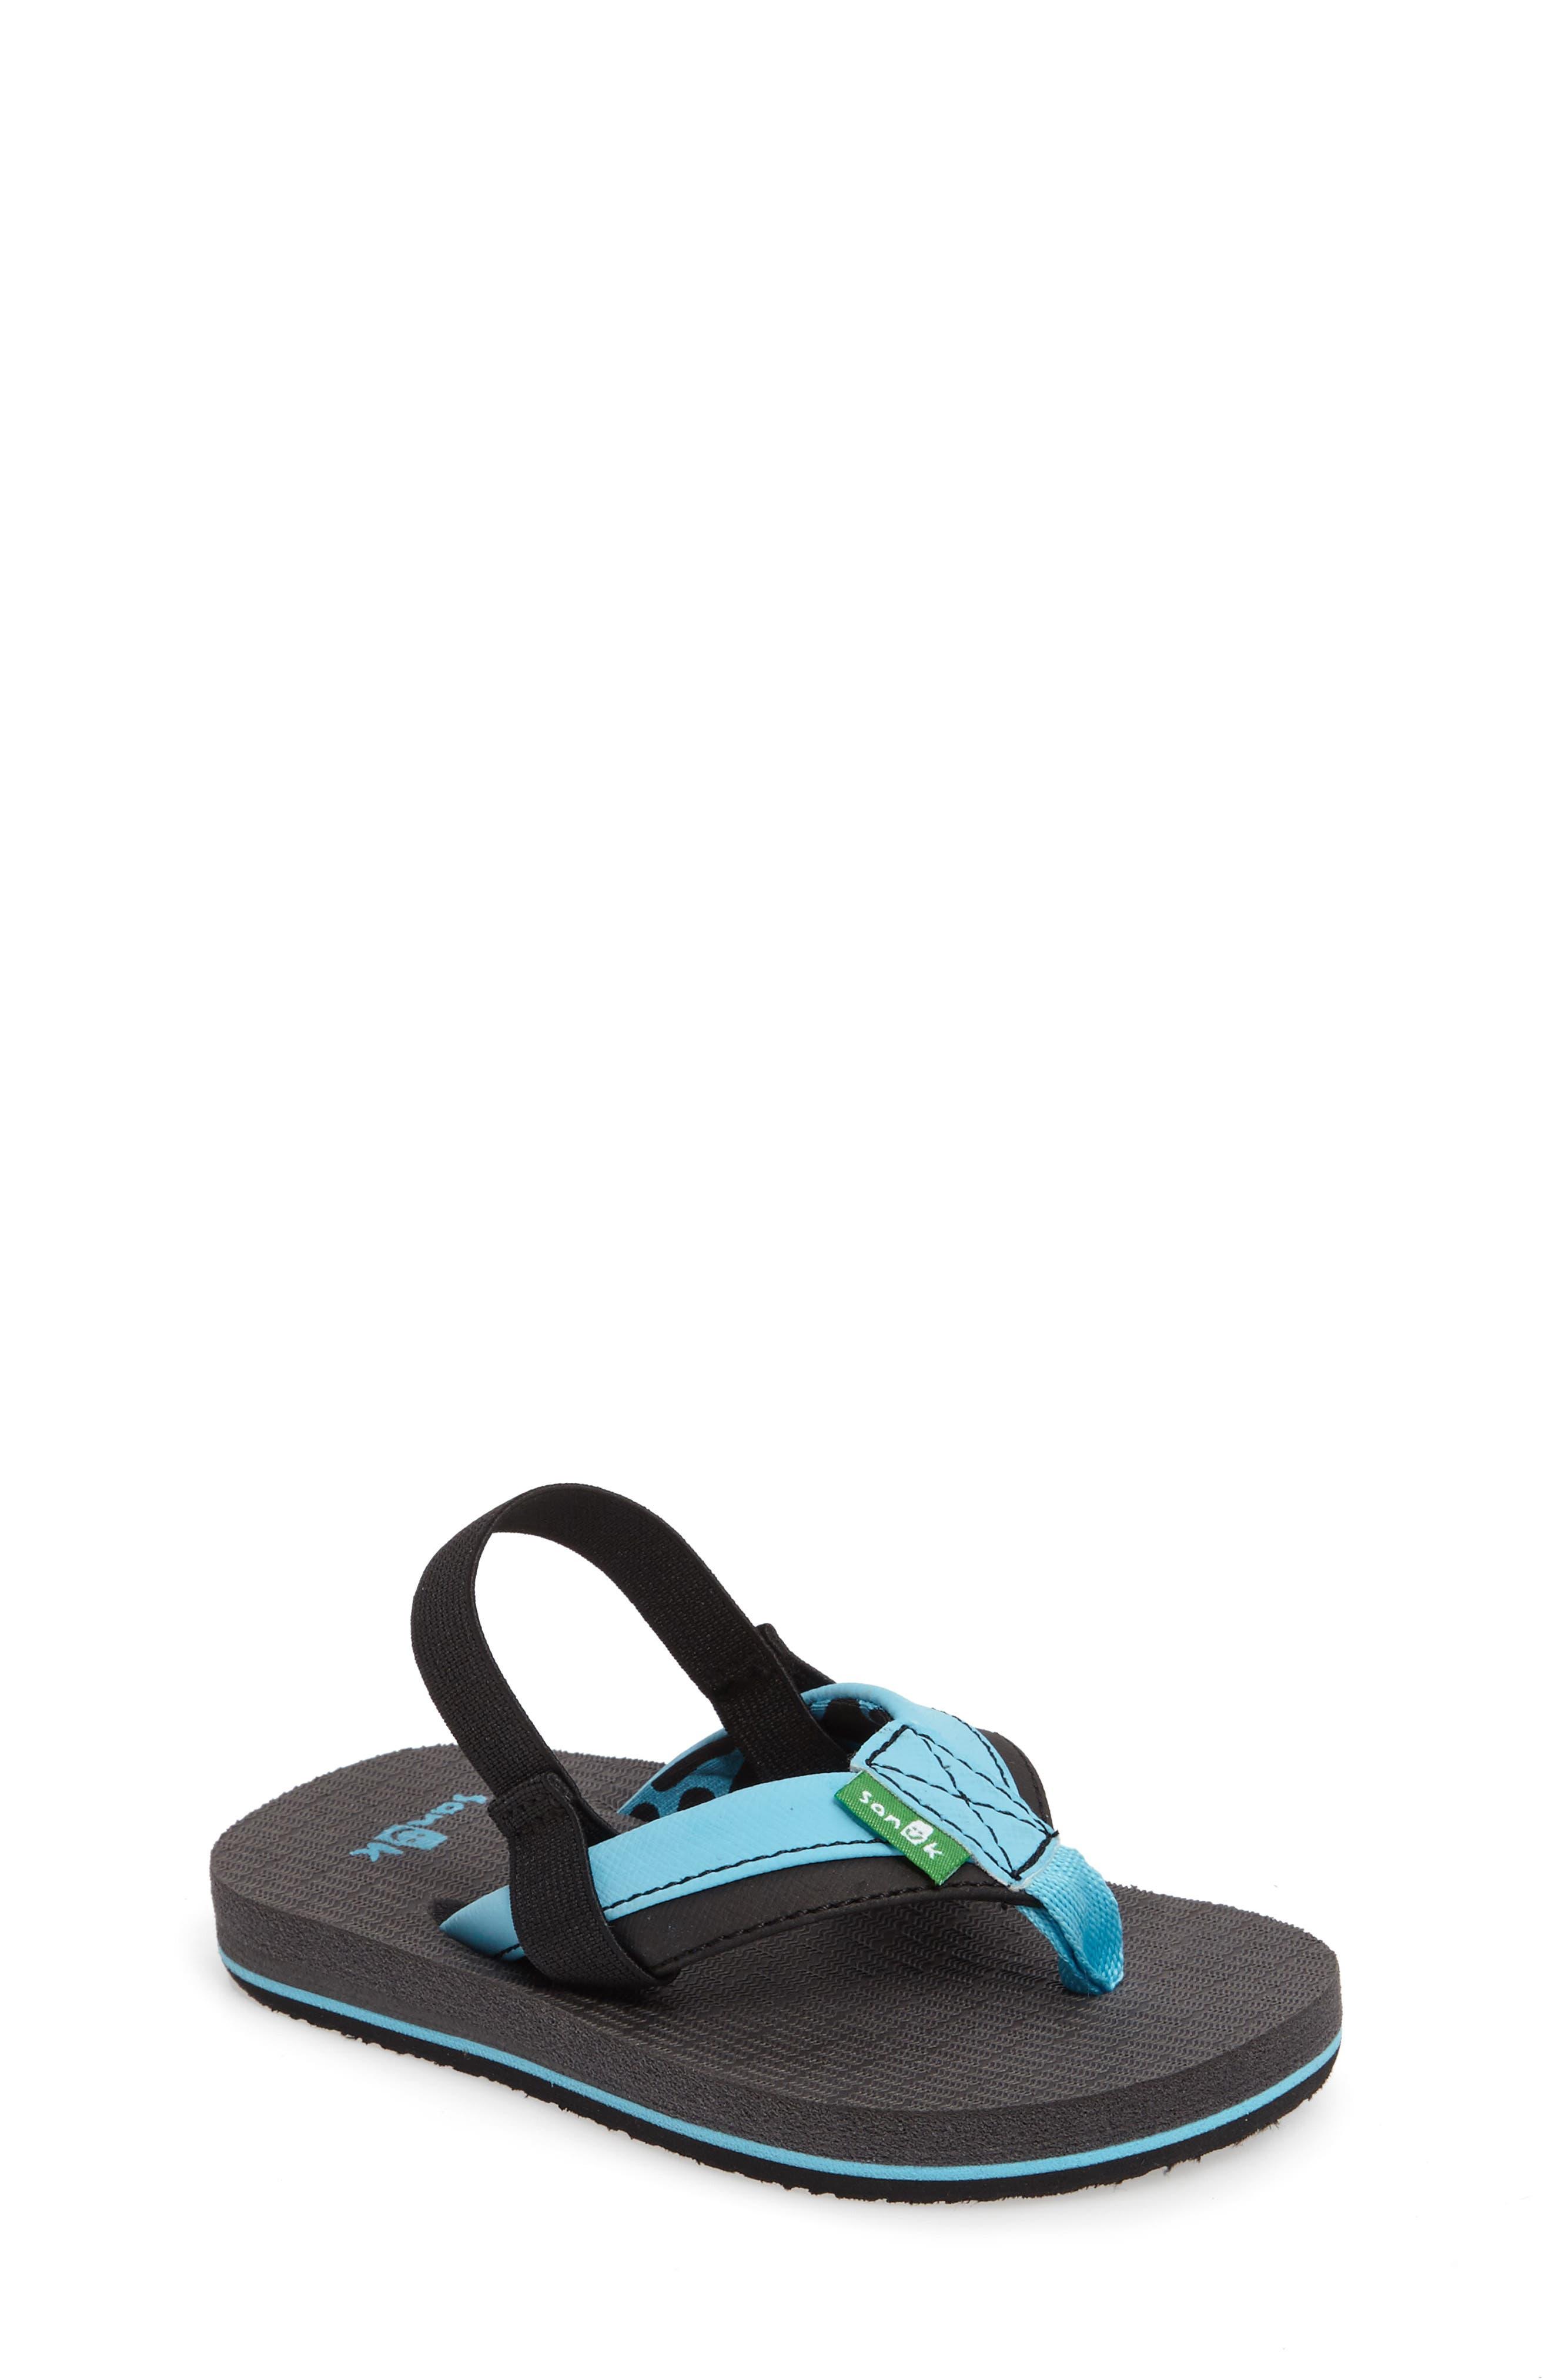 'Rootbeer Cozy' Lightweight Flip Flop Sandal,                             Main thumbnail 4, color,